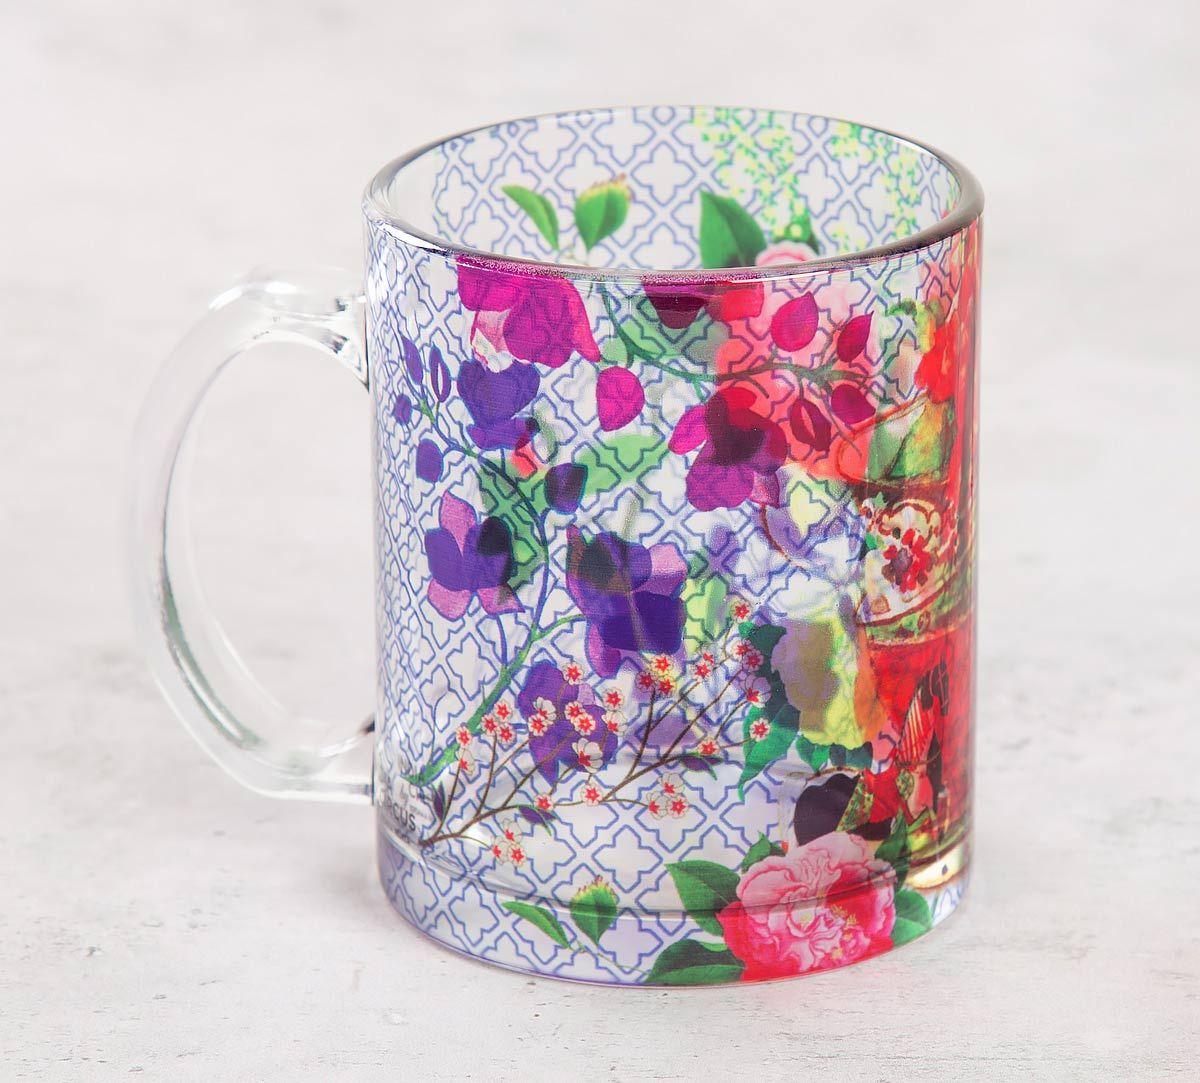 India Circus Floral Cup Illusion Glass Mug